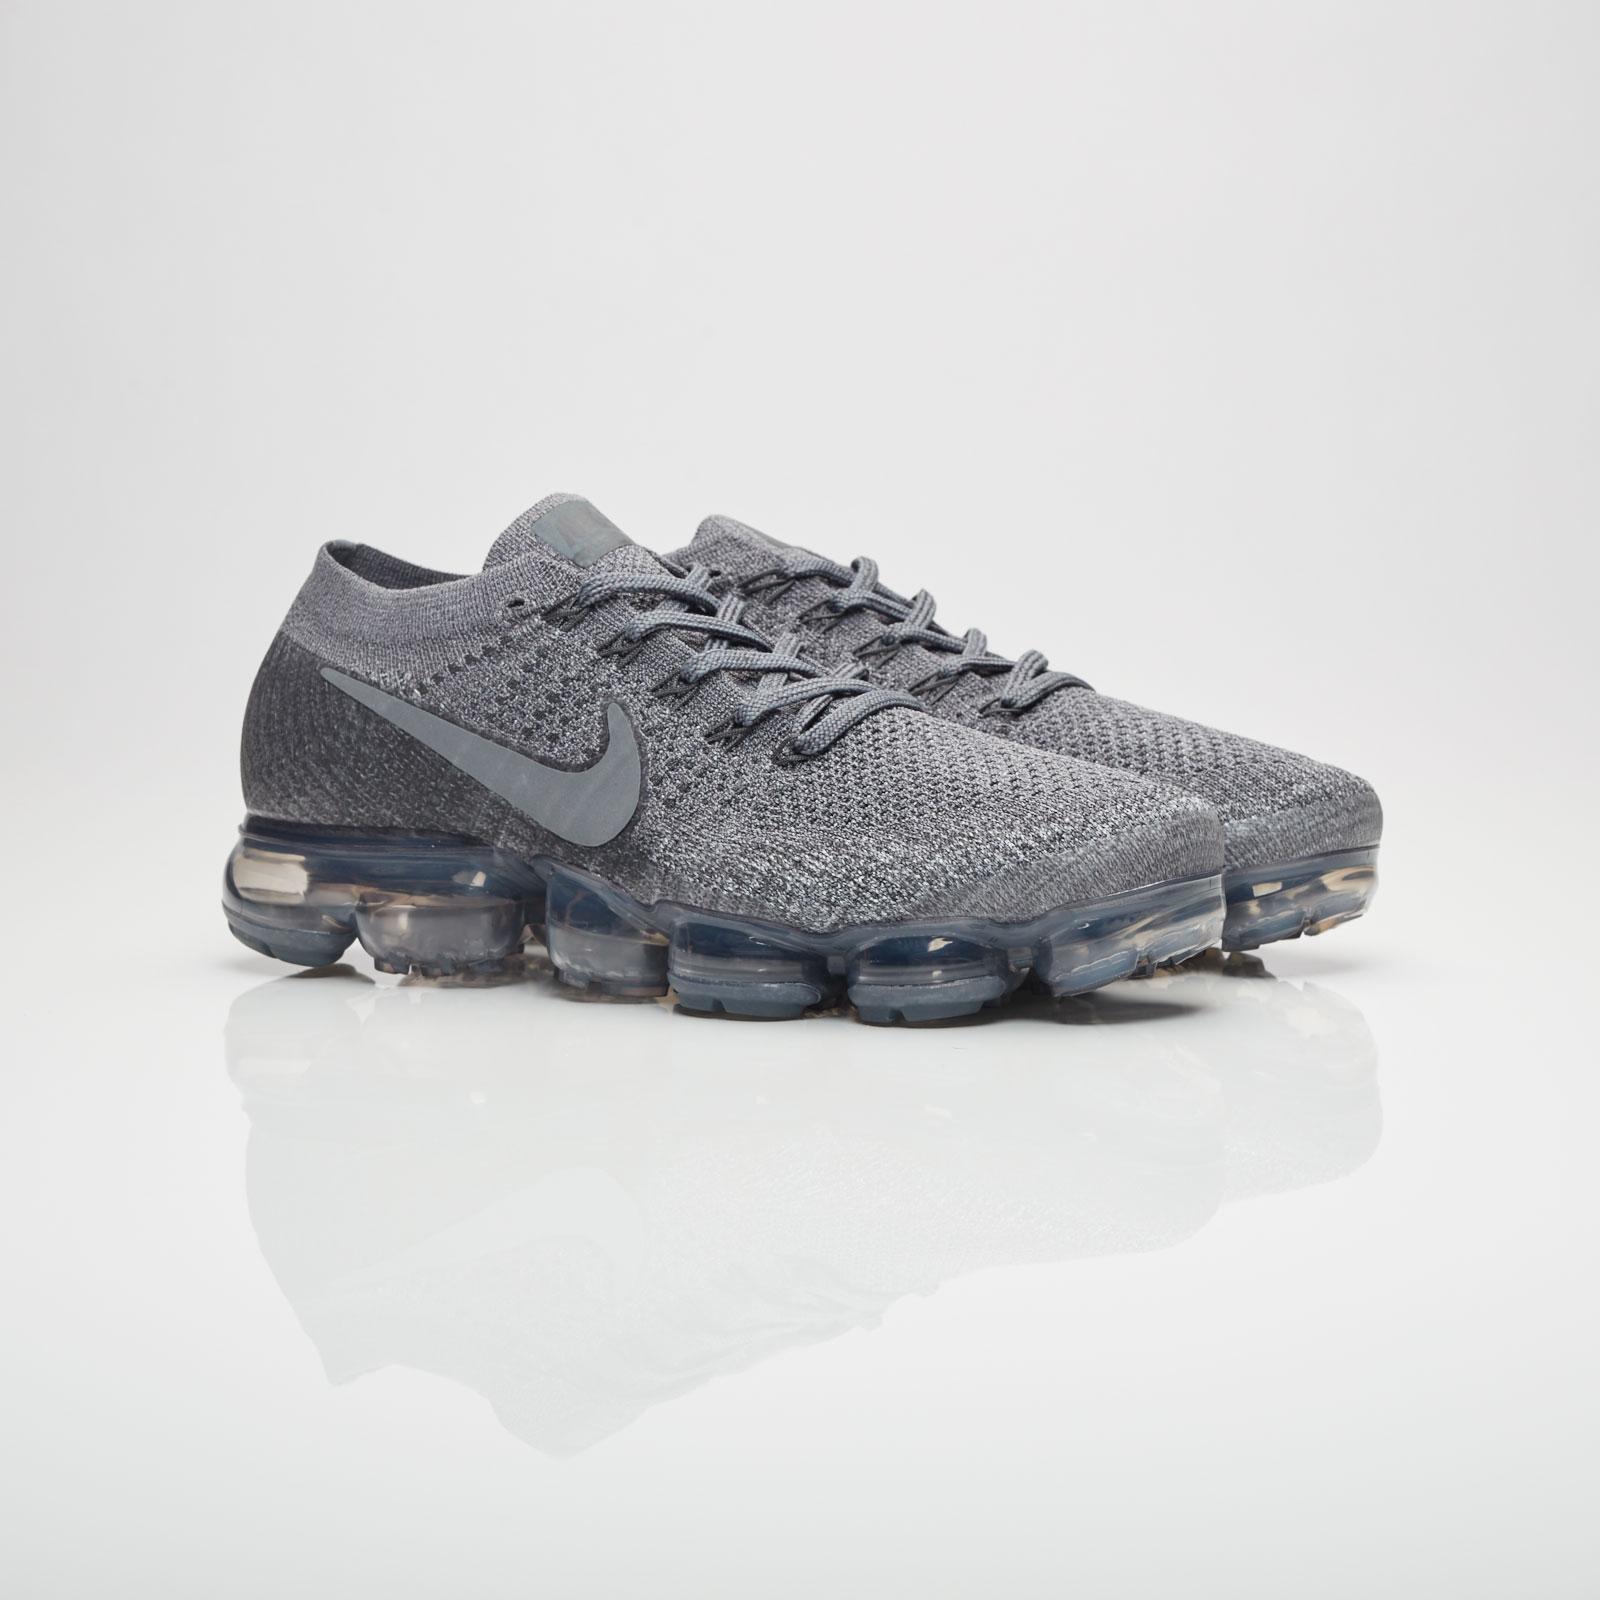 6f47bf1c3ca Nike NikeLab Air Vapormax Flyknit - 899473-005 - Sneakersnstuff ...